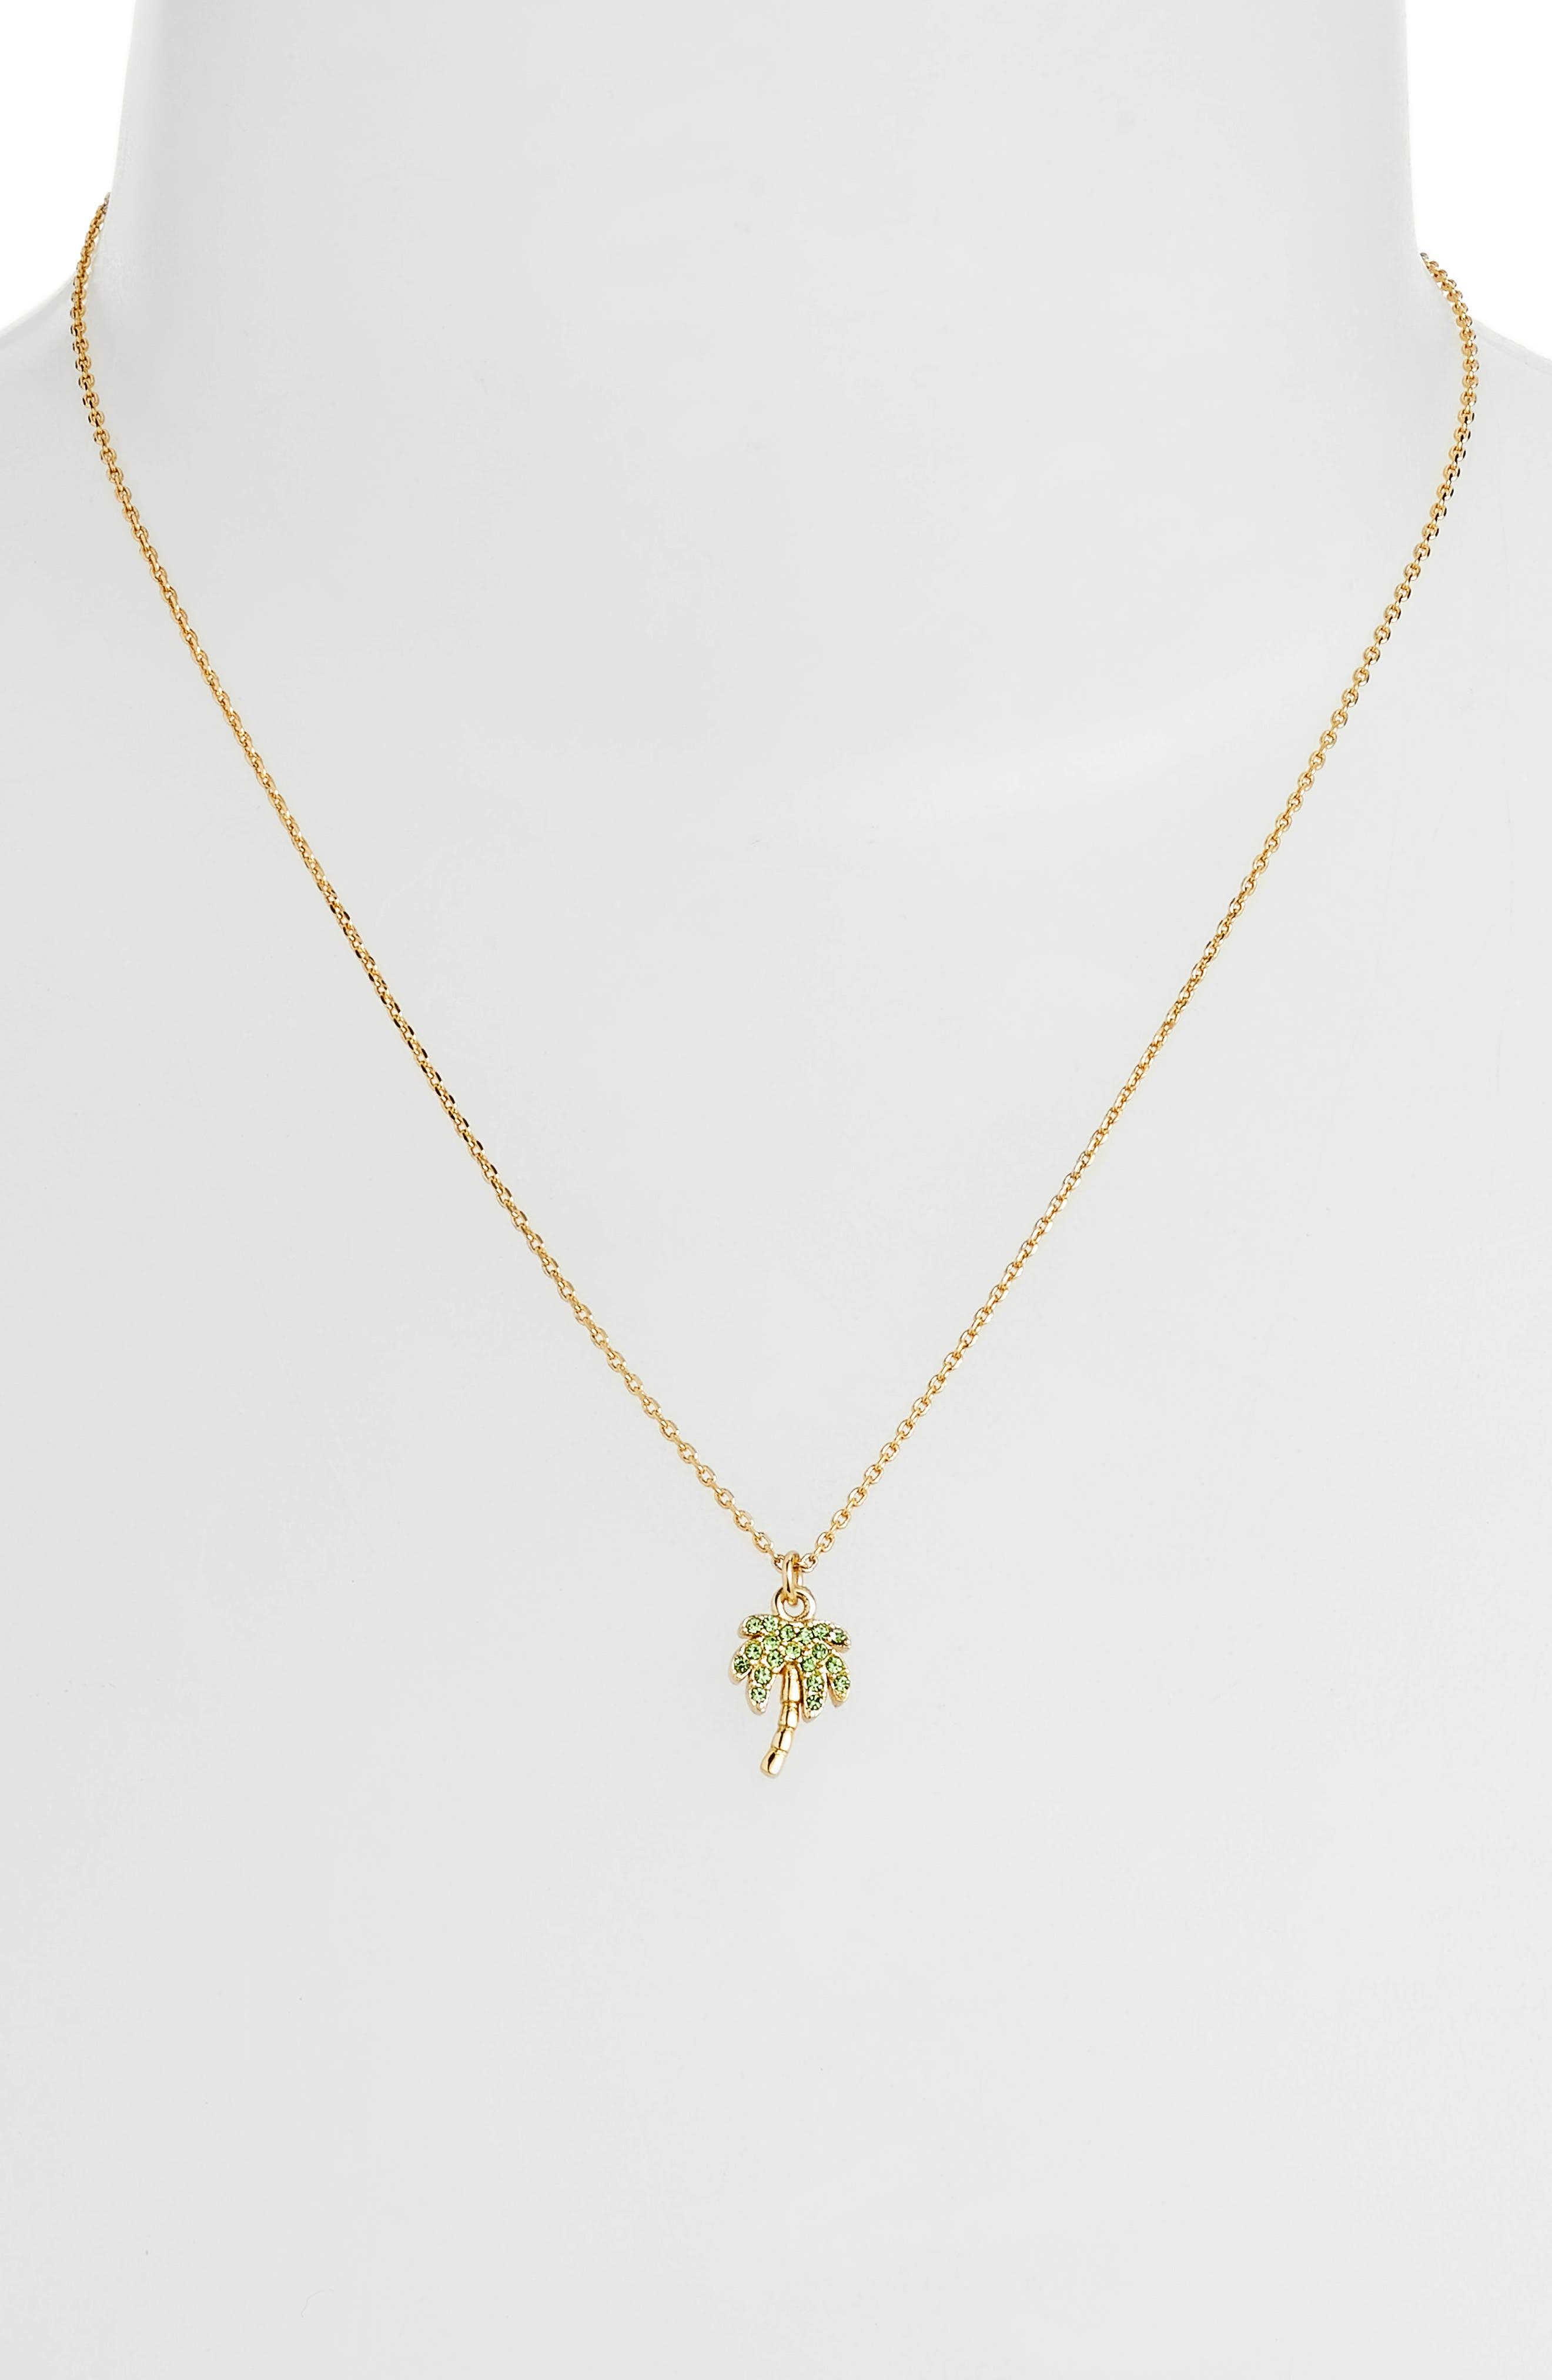 california dreaming pavé palm pendant necklace,                             Alternate thumbnail 2, color,                             Multi